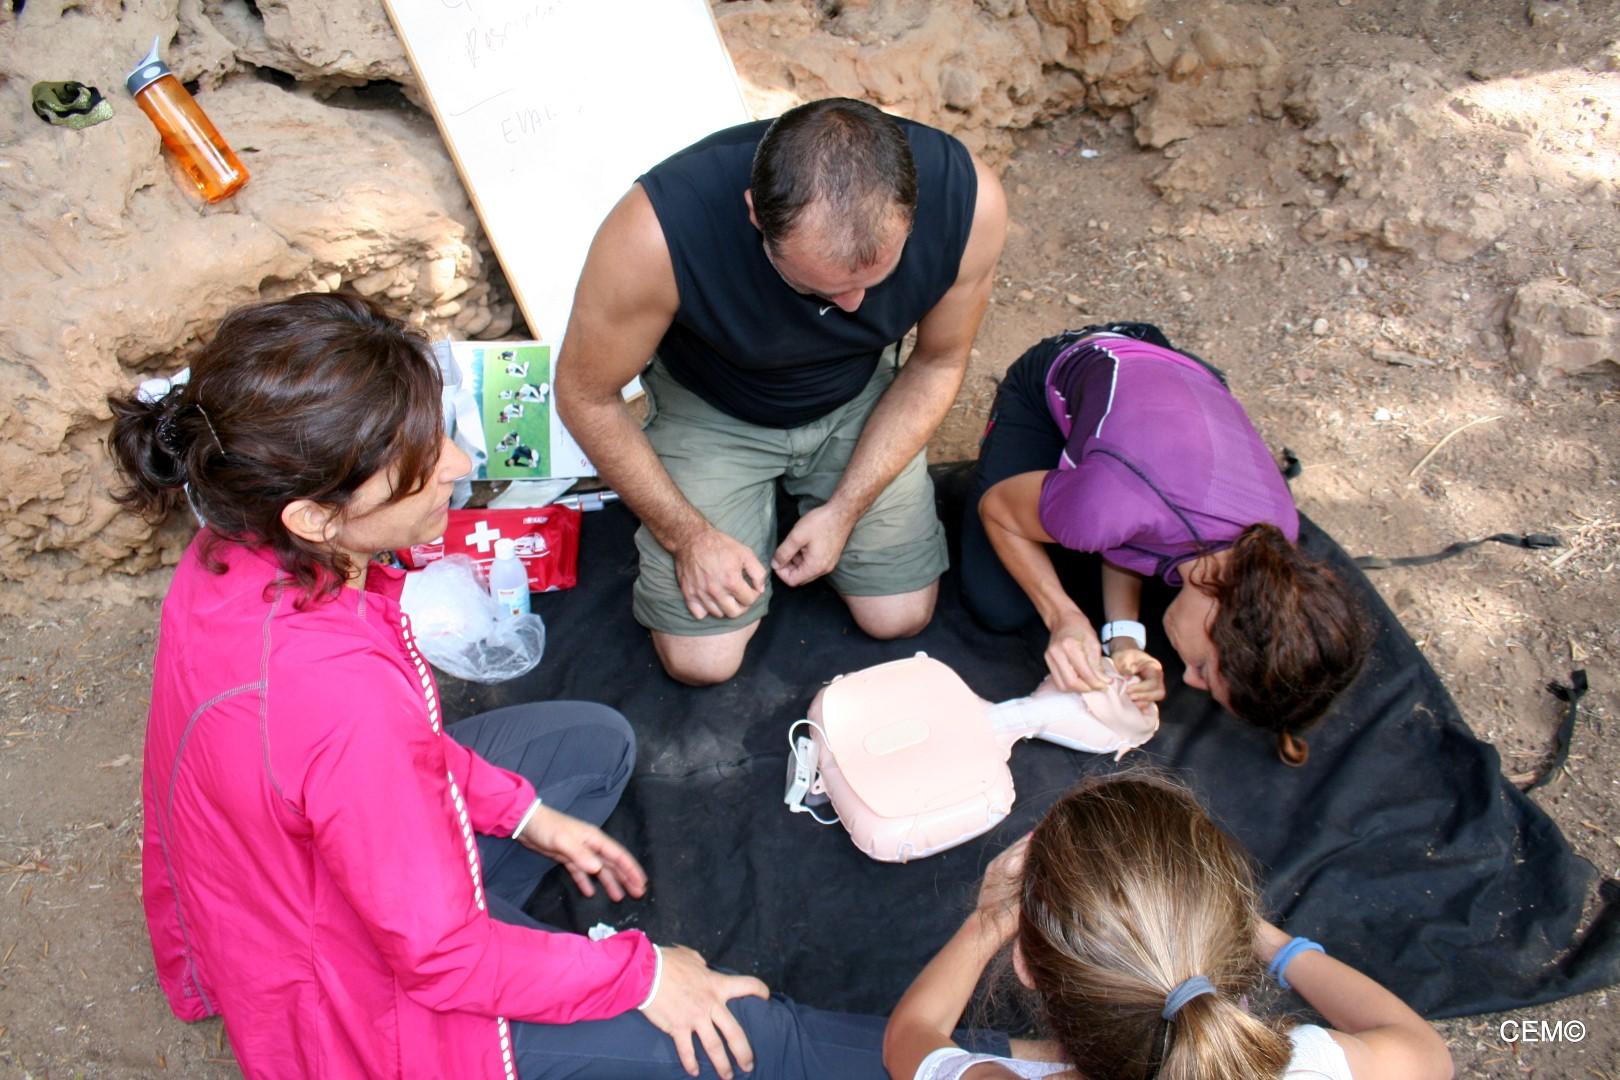 actividad-cem-escalada-taller-primeros-auxilios-2016-01